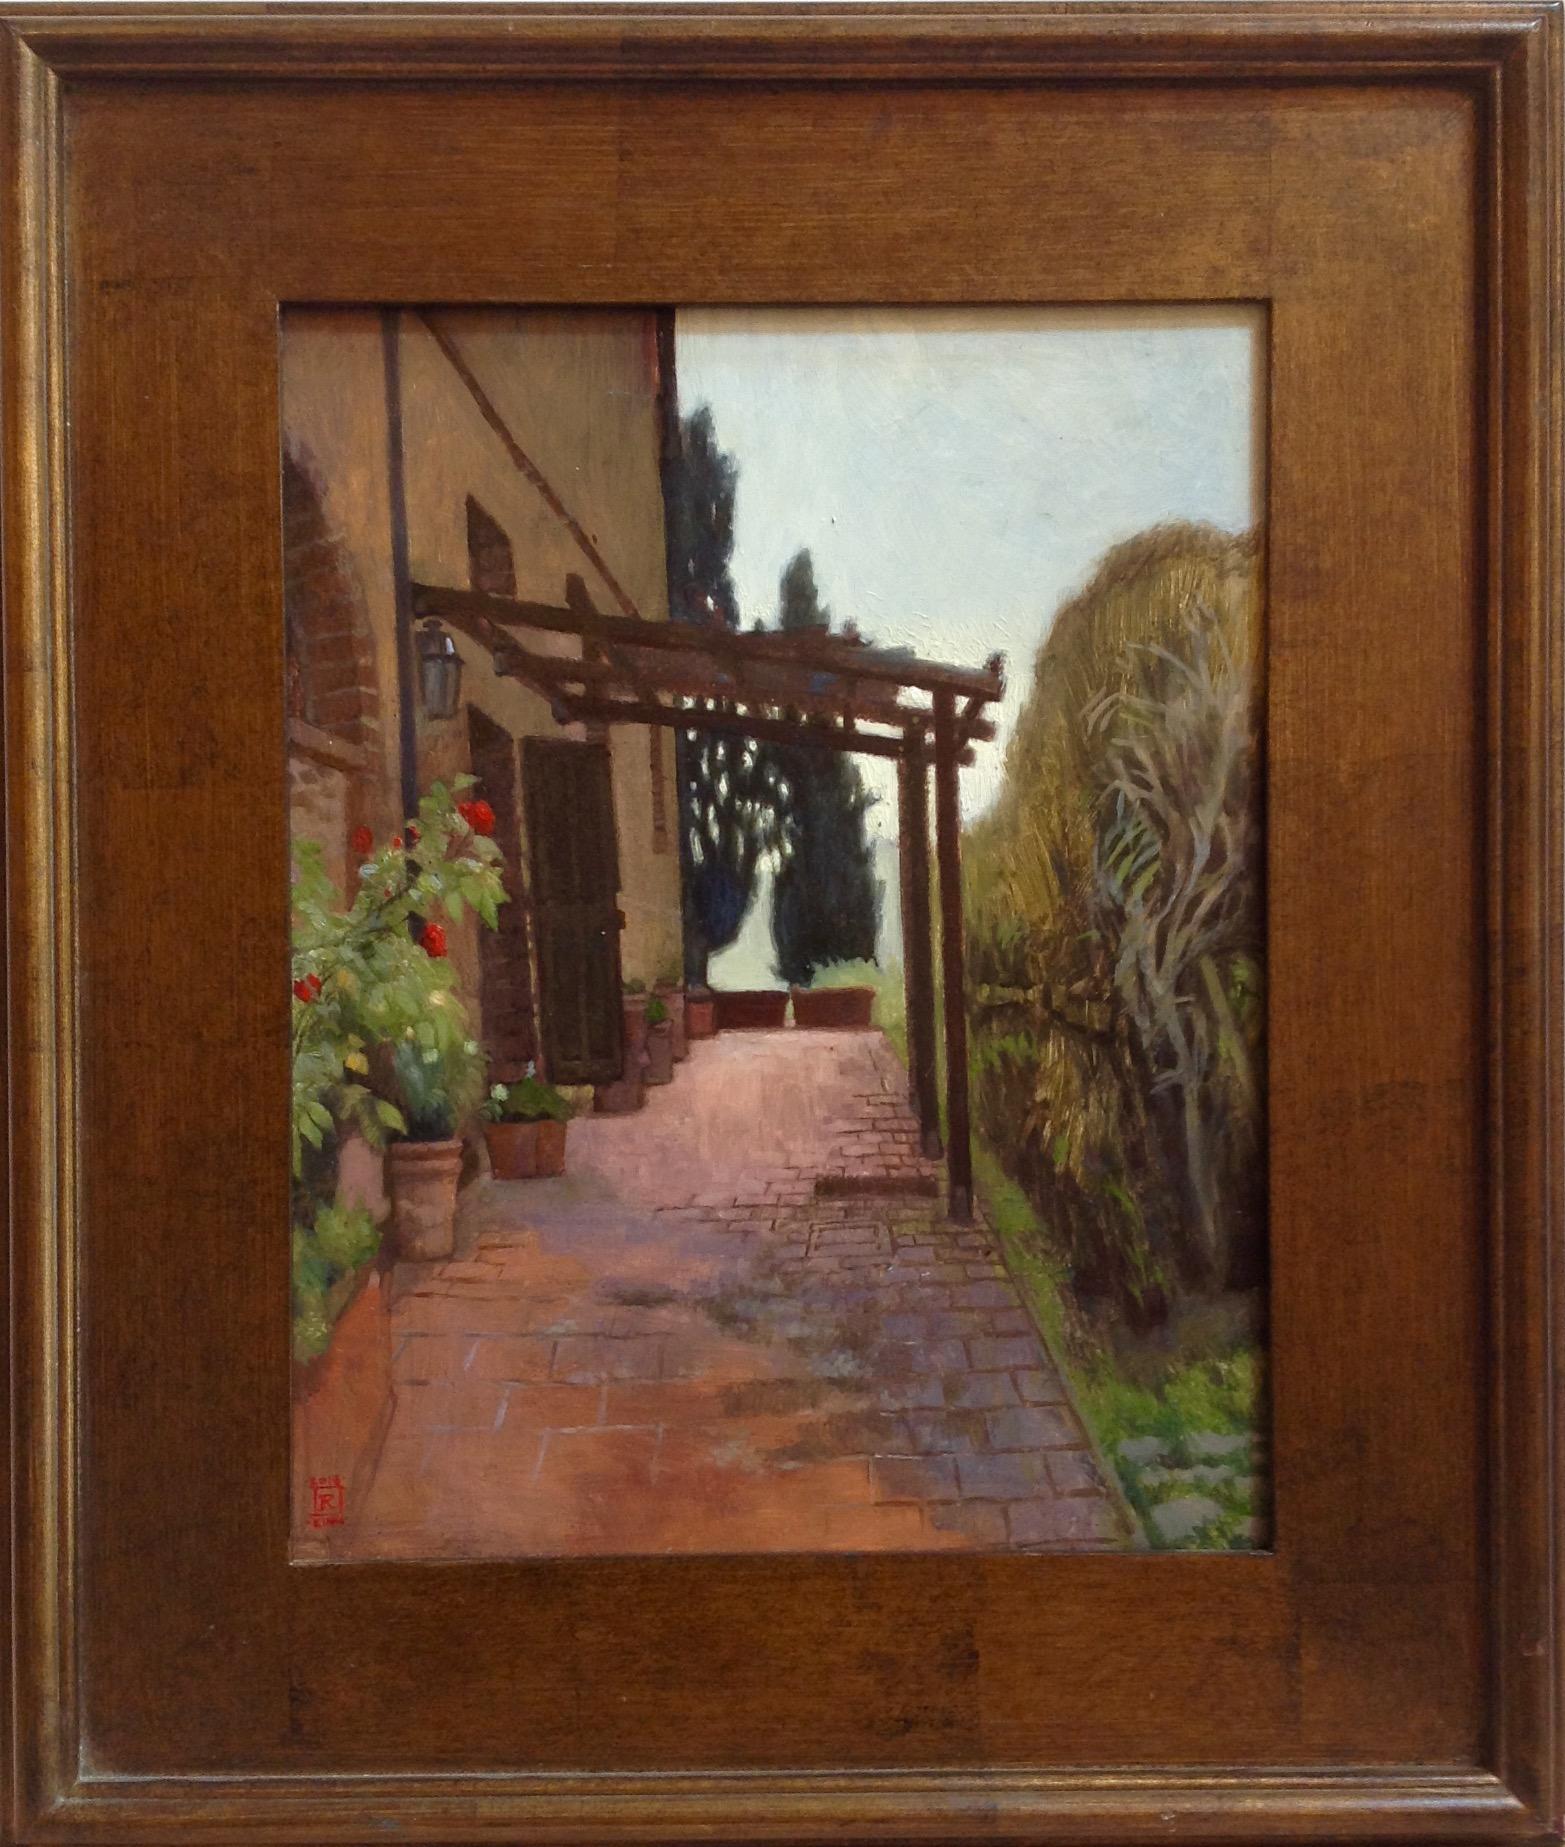 Morning Walk Oil on panel 11x14 by Rebecca King Hawkinson